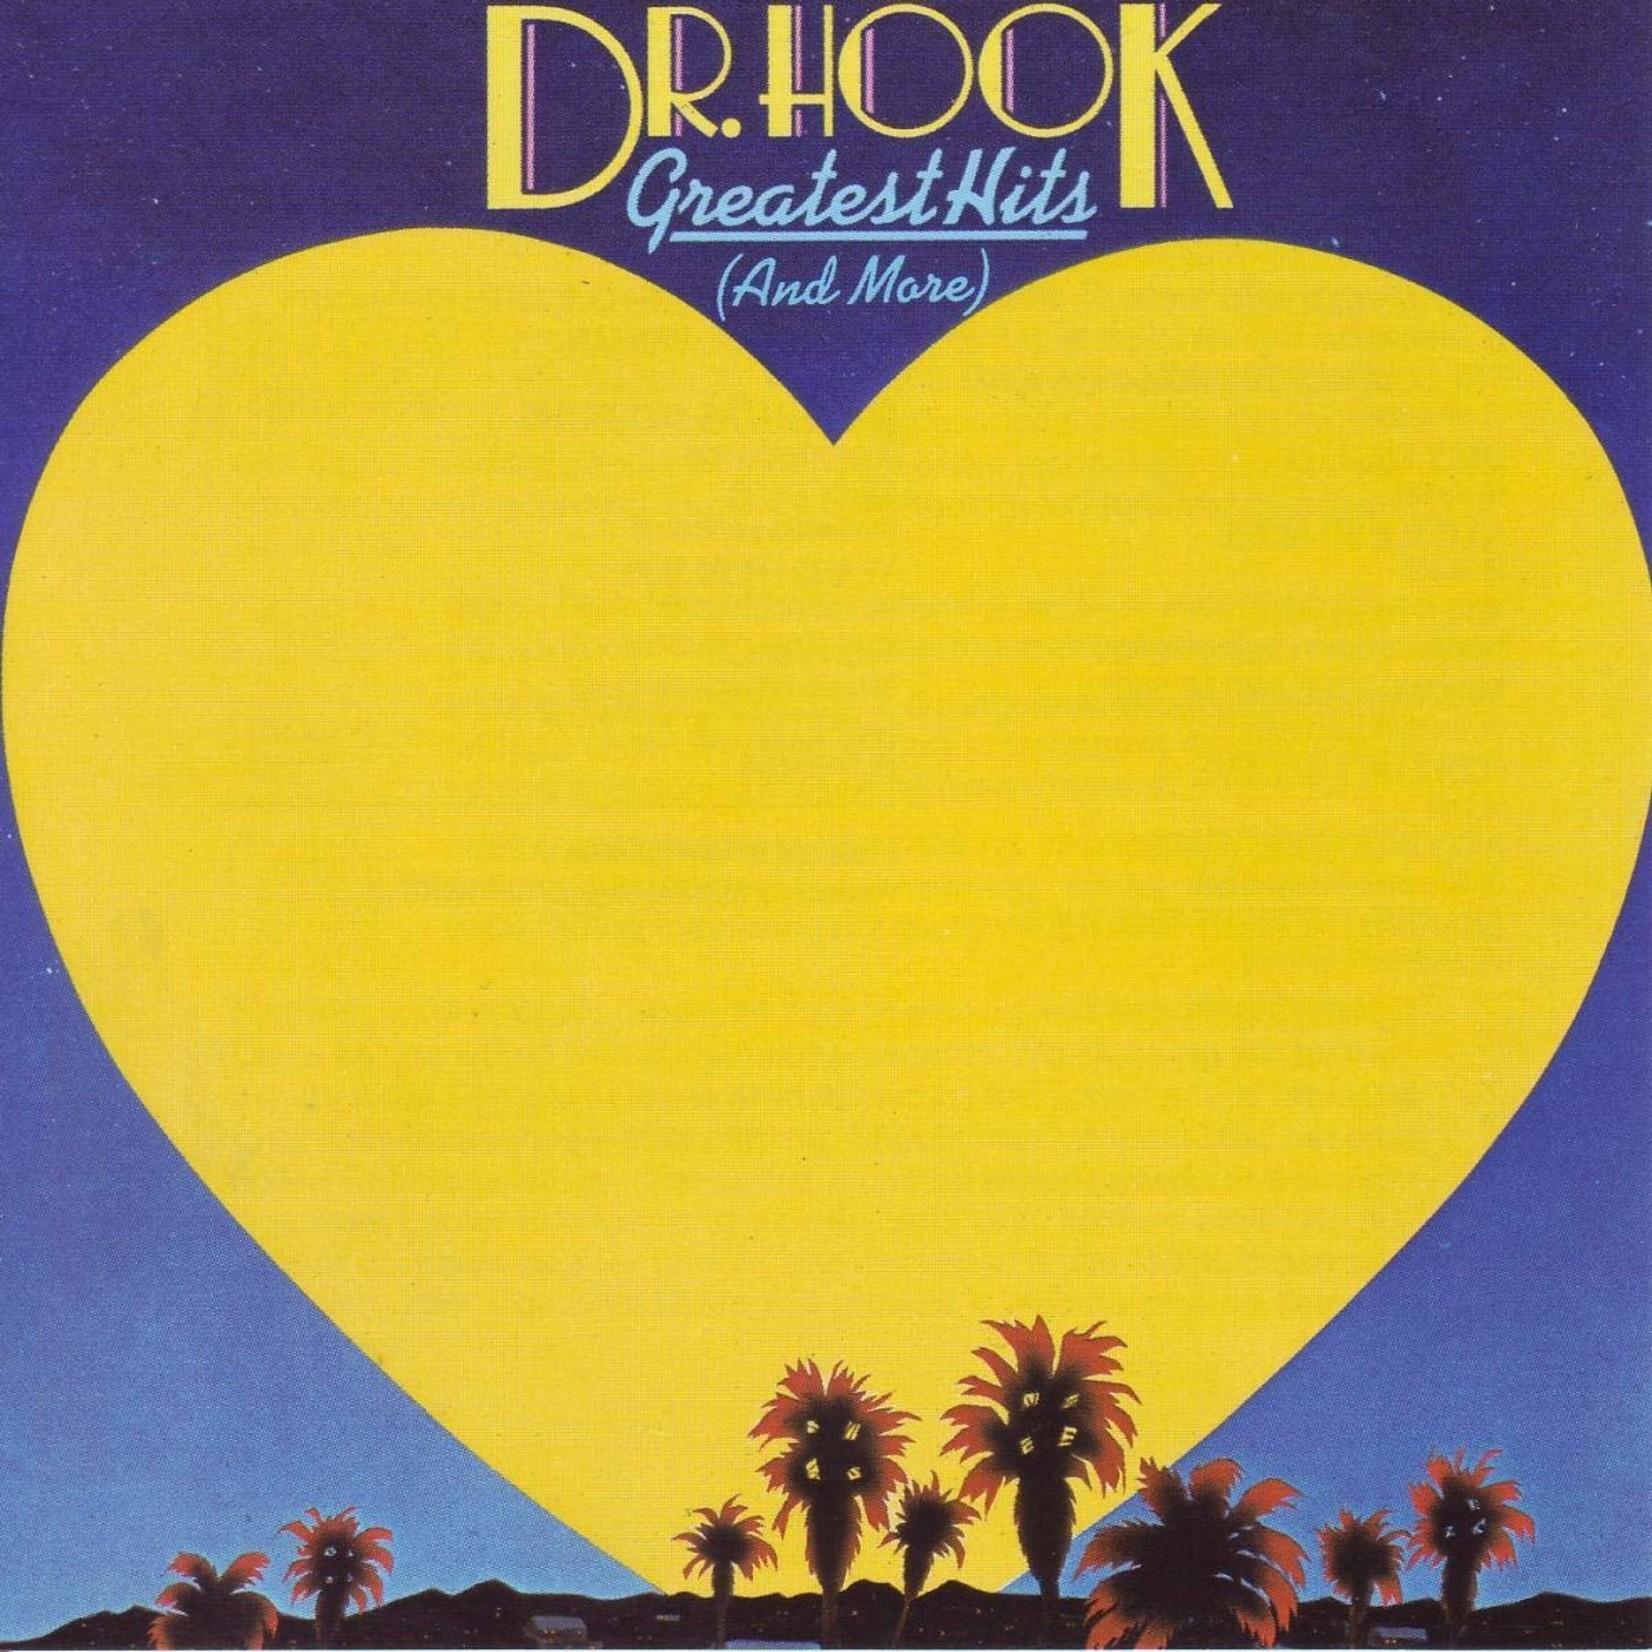 [Vintage] Dr. Hook: Greatest Hits (or Best of)